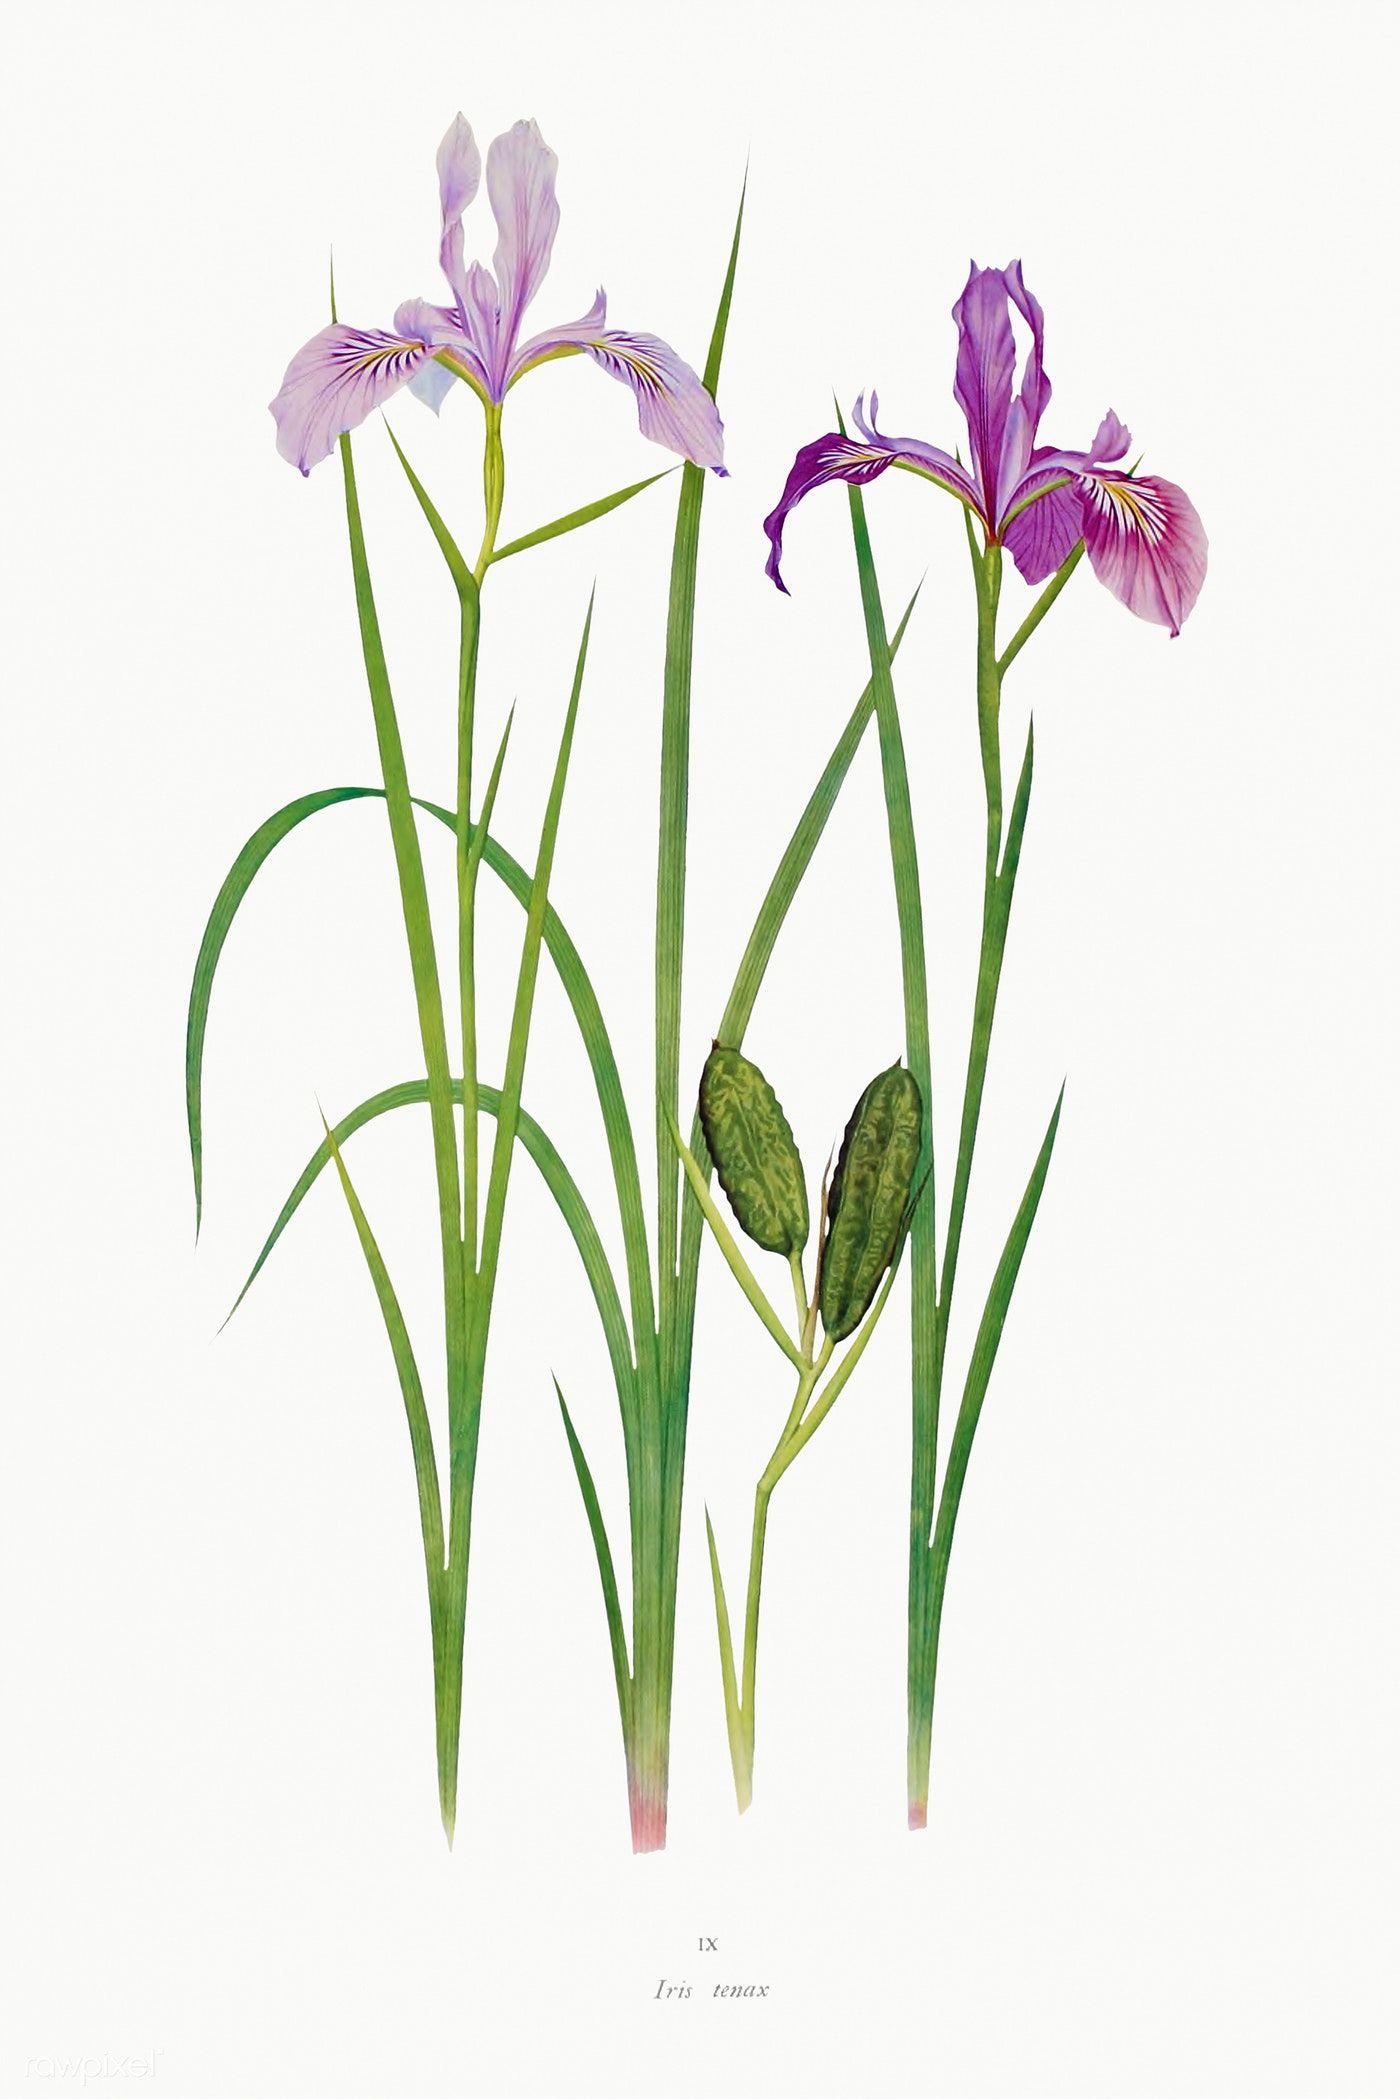 Vintage Iris Flower Illustration Template Premium Image By Rawpixel Com In 2020 Flower Illustration Iris Flowers Flower Drawing